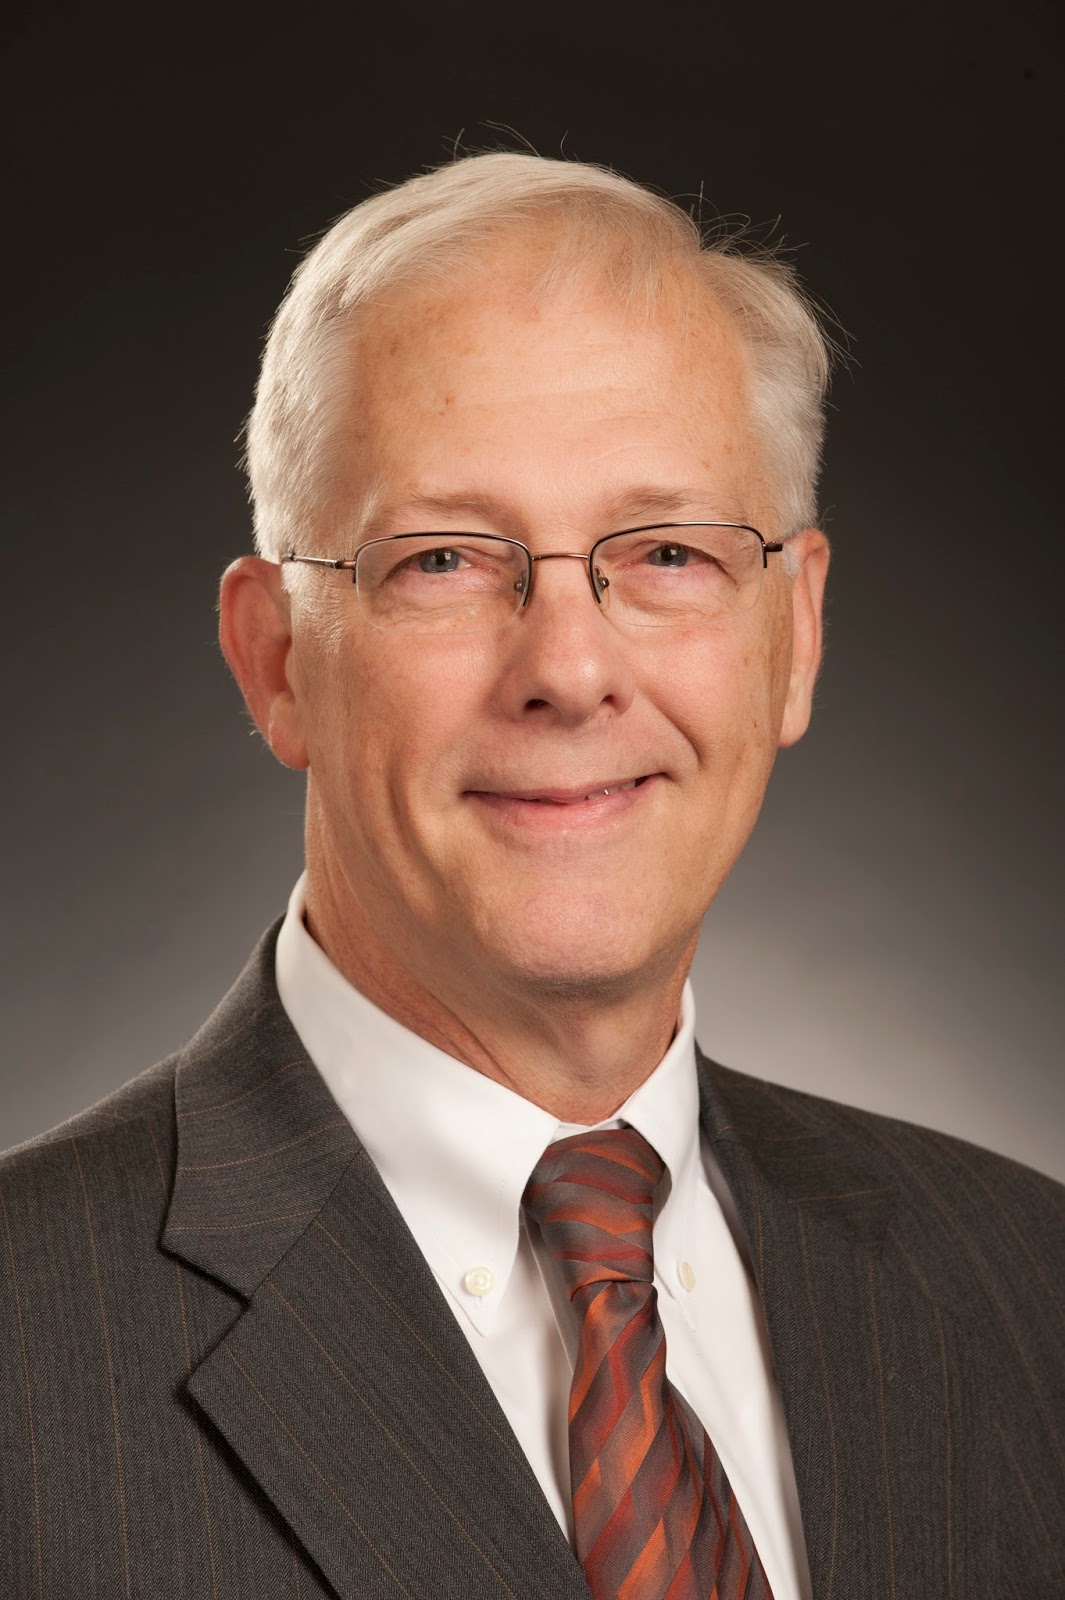 Donald Feldmann, Esq. Rippe & Kingston Capital Advisors, Inc